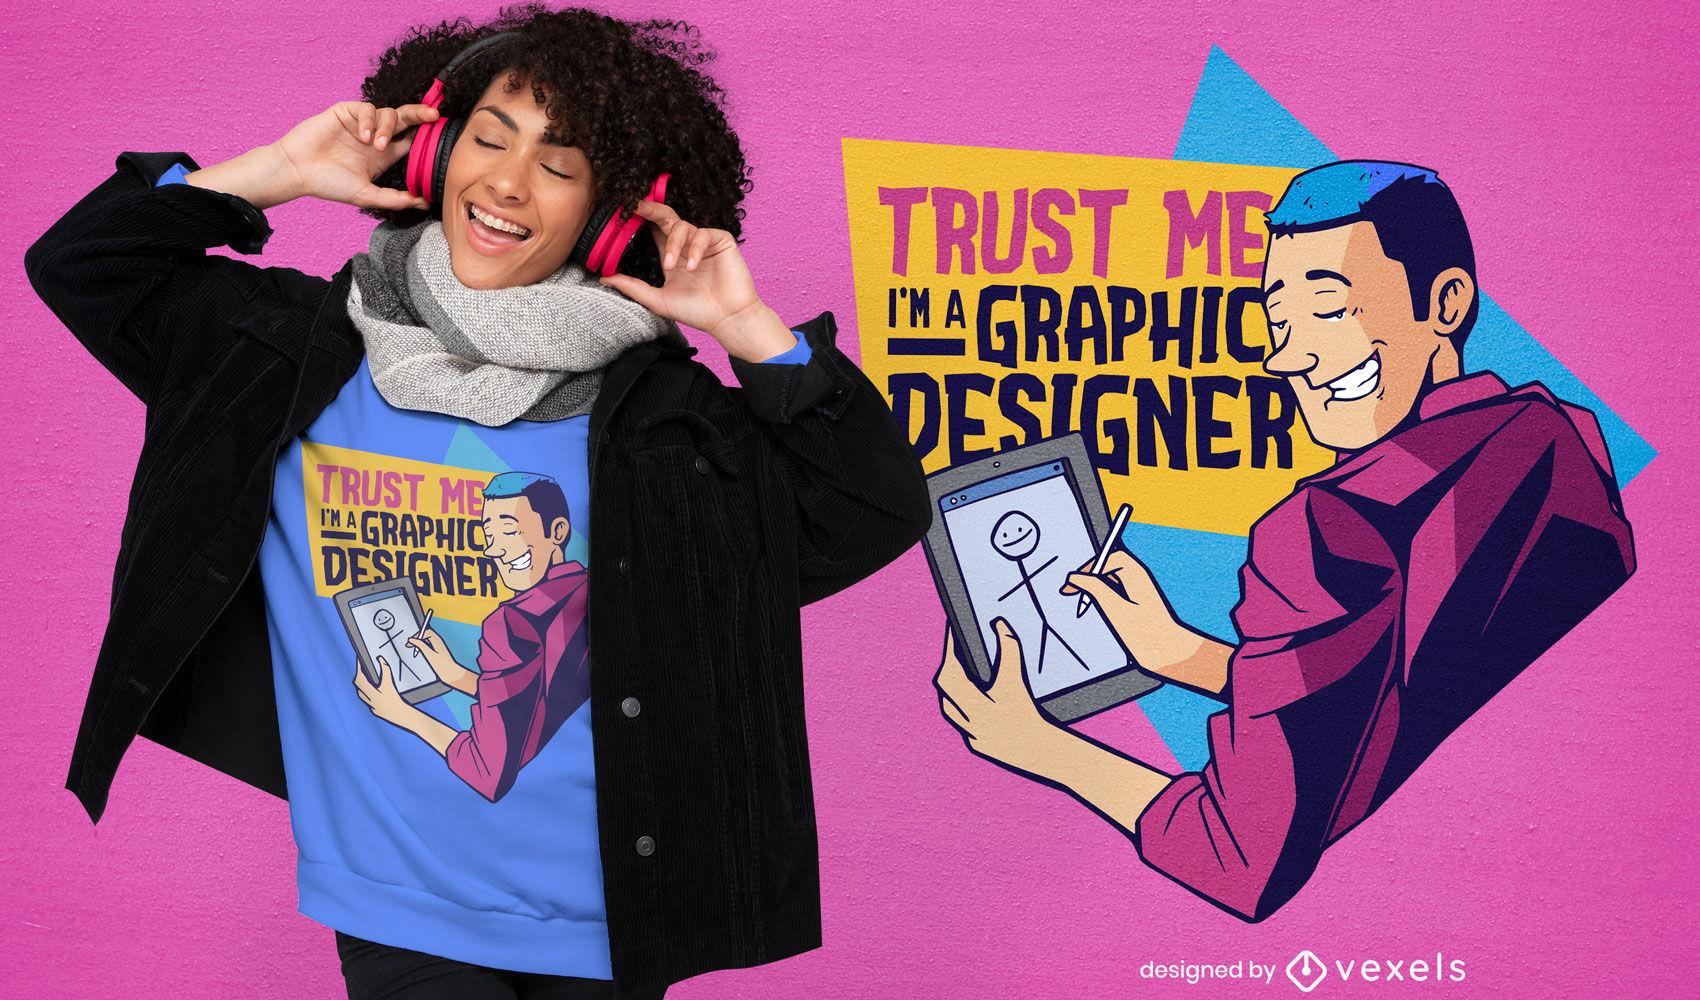 Graphic designer funny t-shirt design